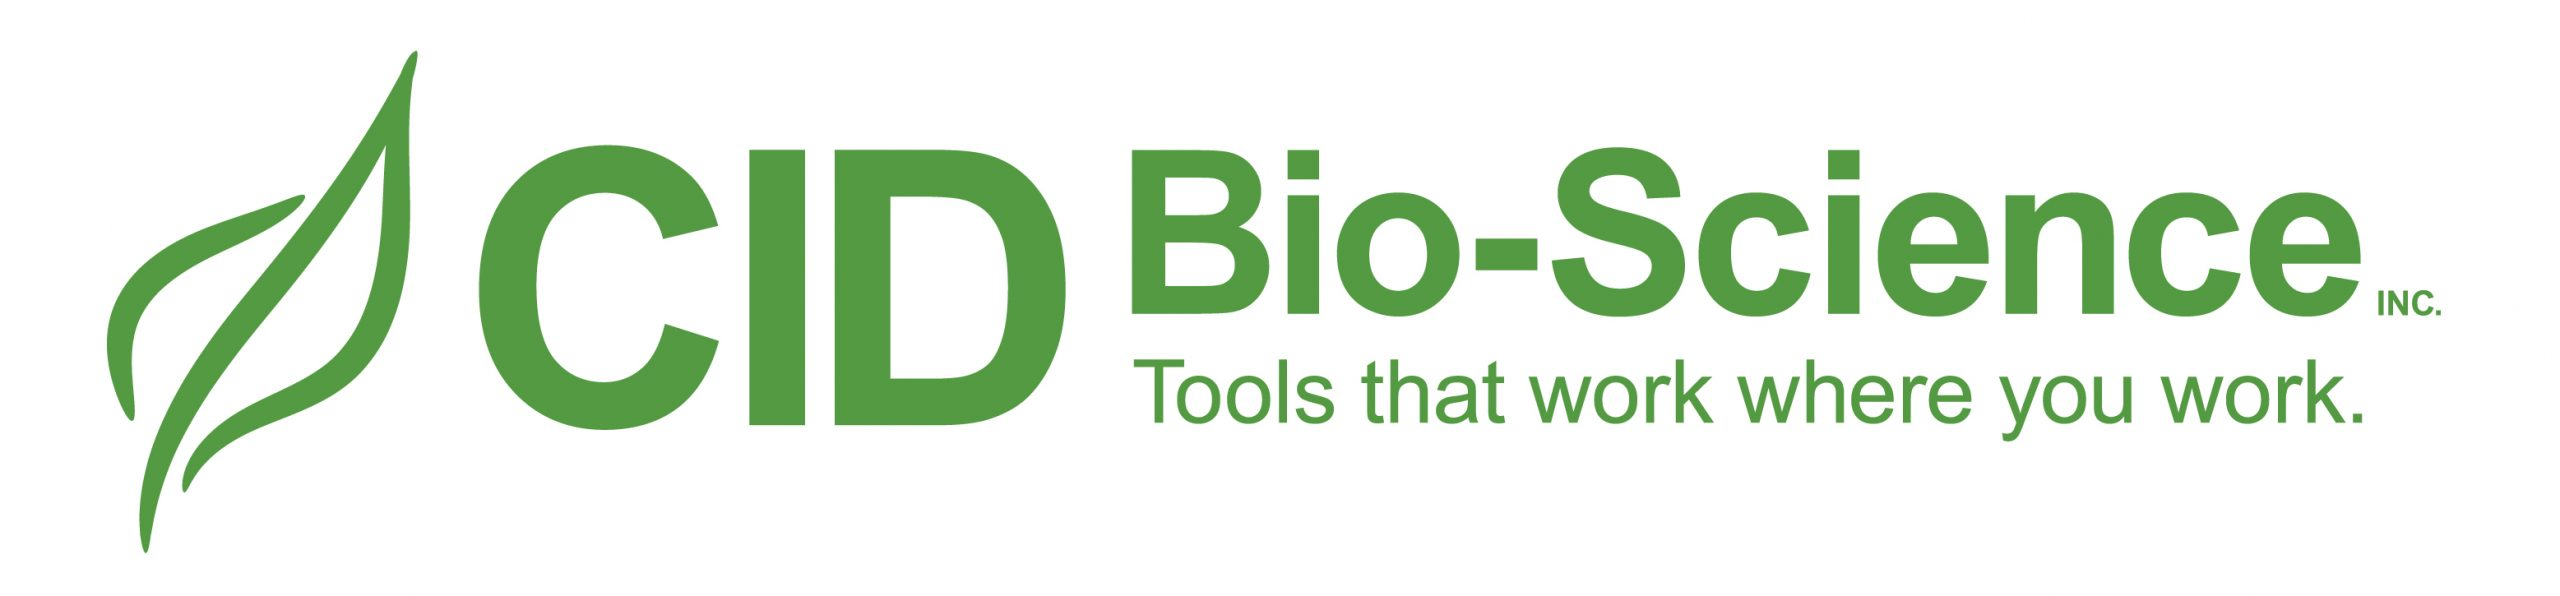 CID BioScience